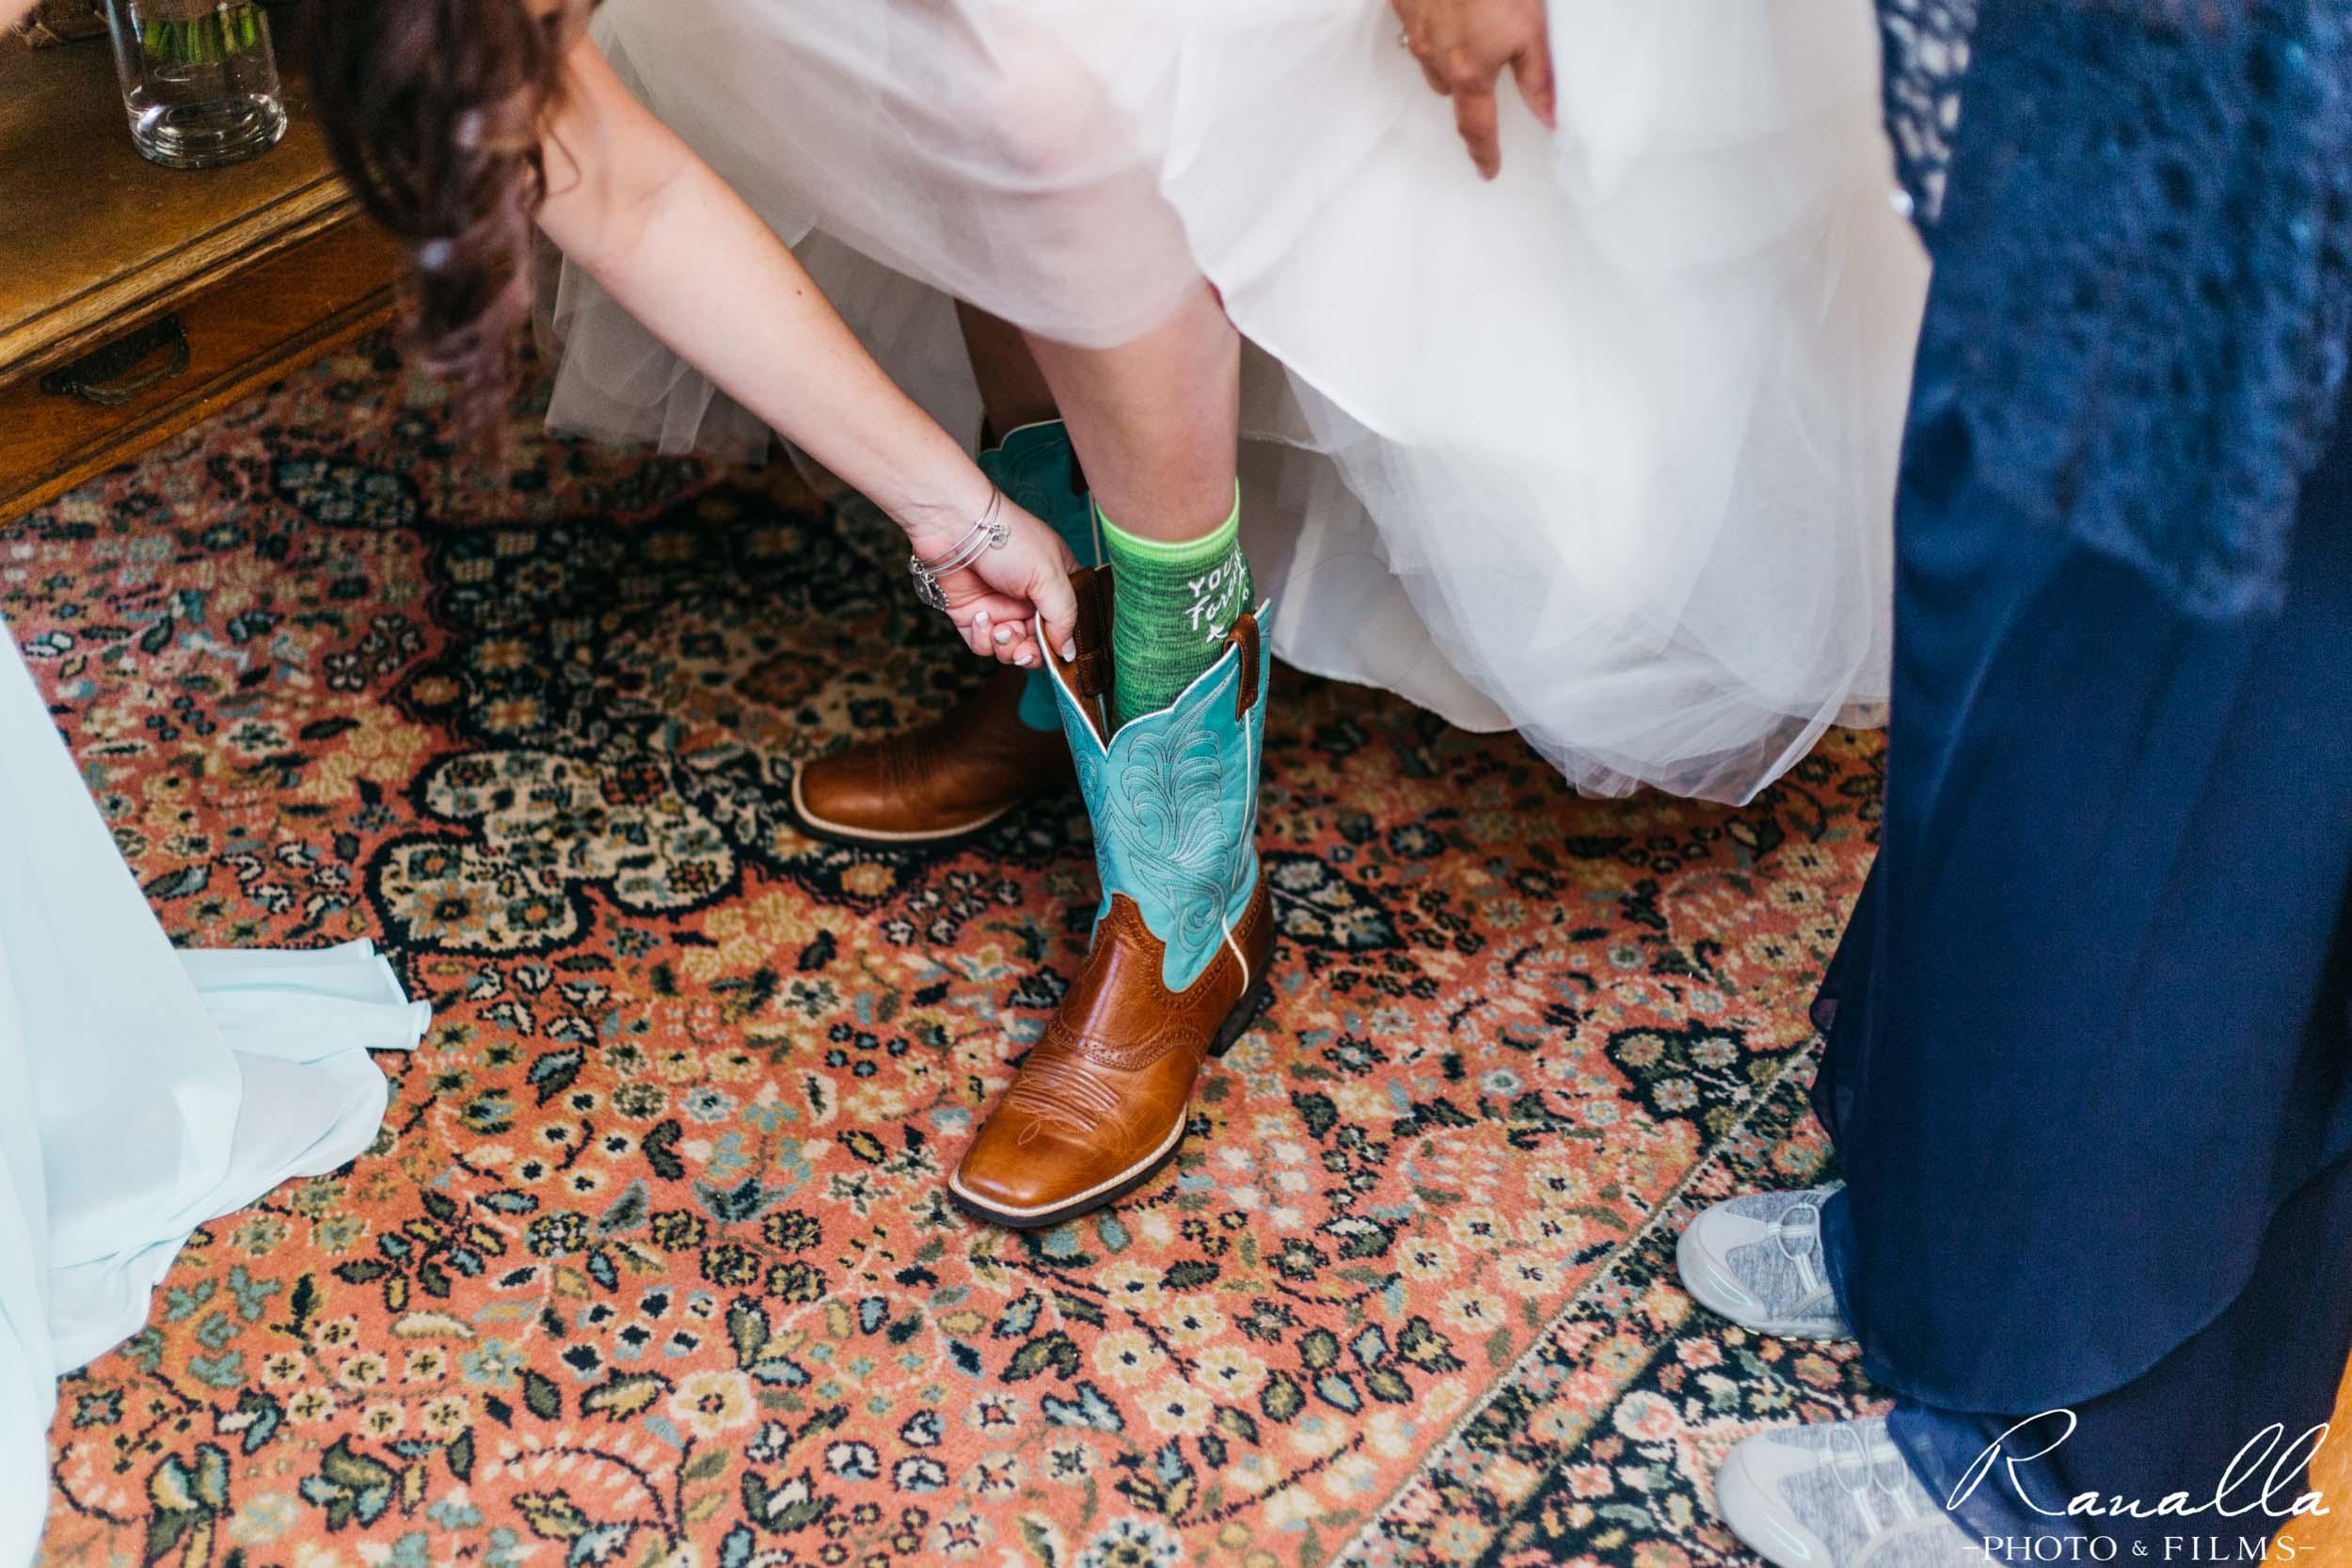 Chico Wedding Photography- Bride Getting Ready- Patrick Ranch Wedding Photos- Ranalla Photo & Films